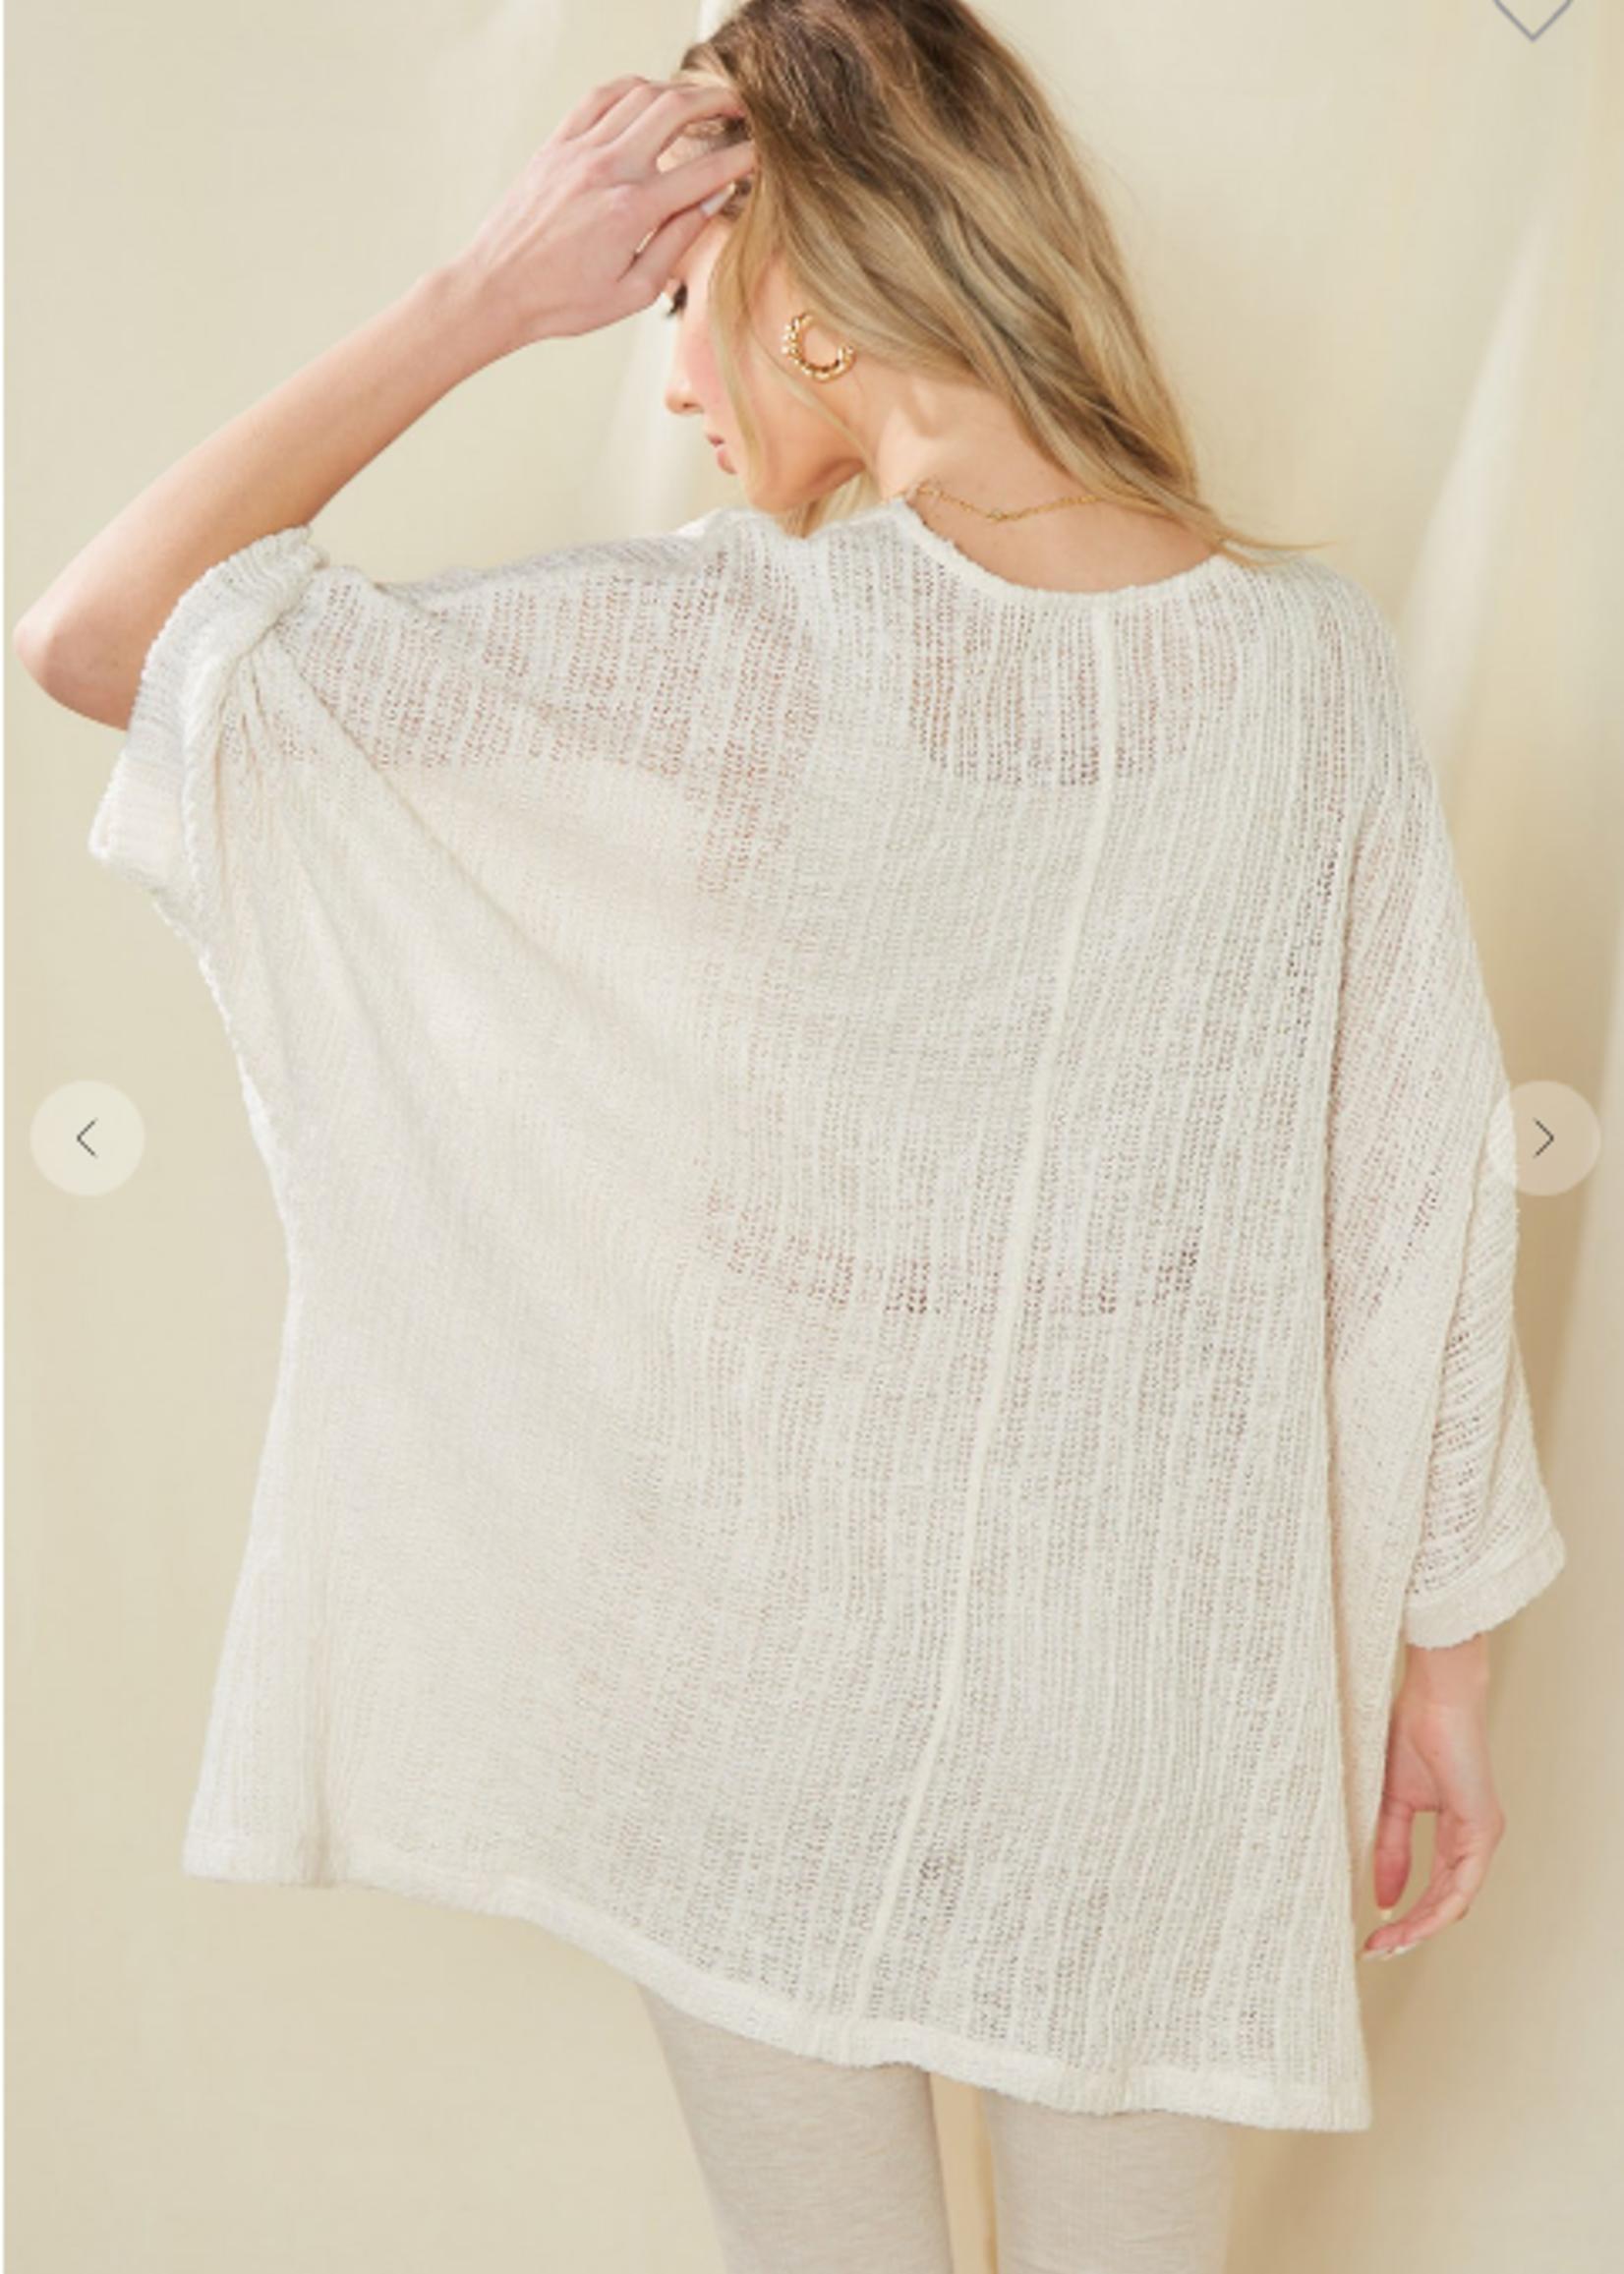 Open Sweater Knit Cardigan - Ivory